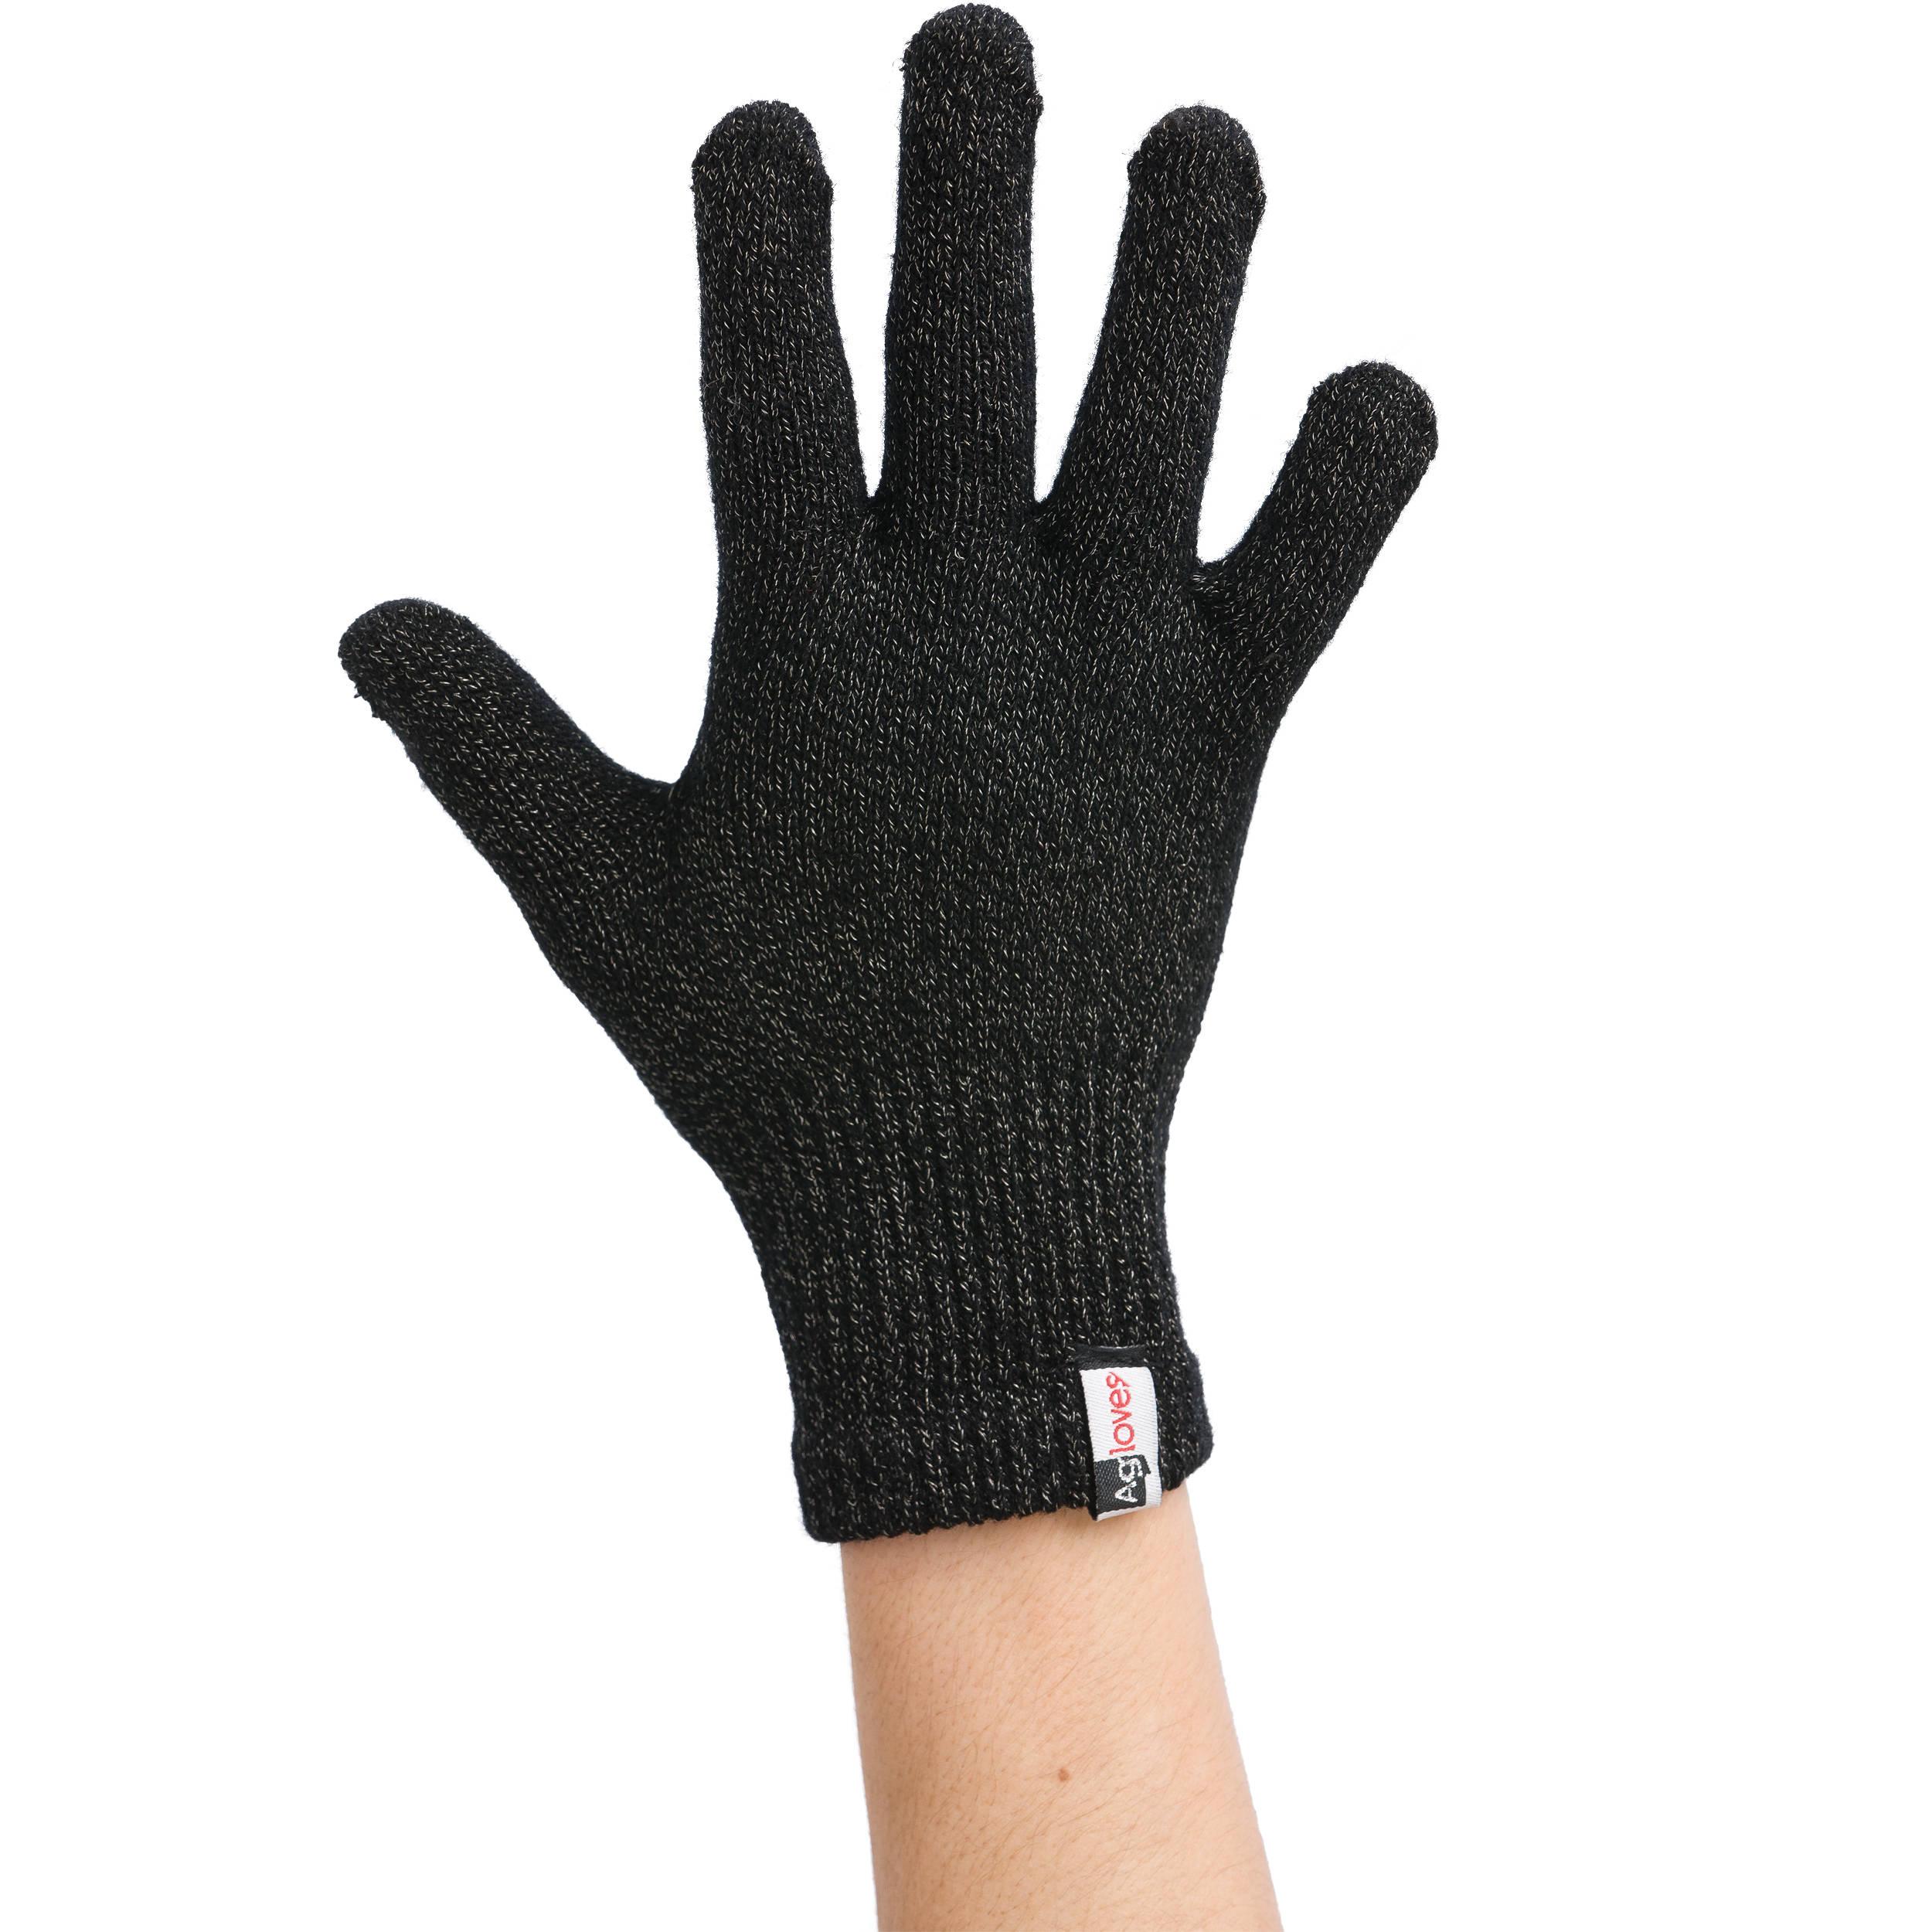 Agloves Sport Touchscreen Gloves: Agloves Sport Touchscreen Gloves (Small/Medium,Black